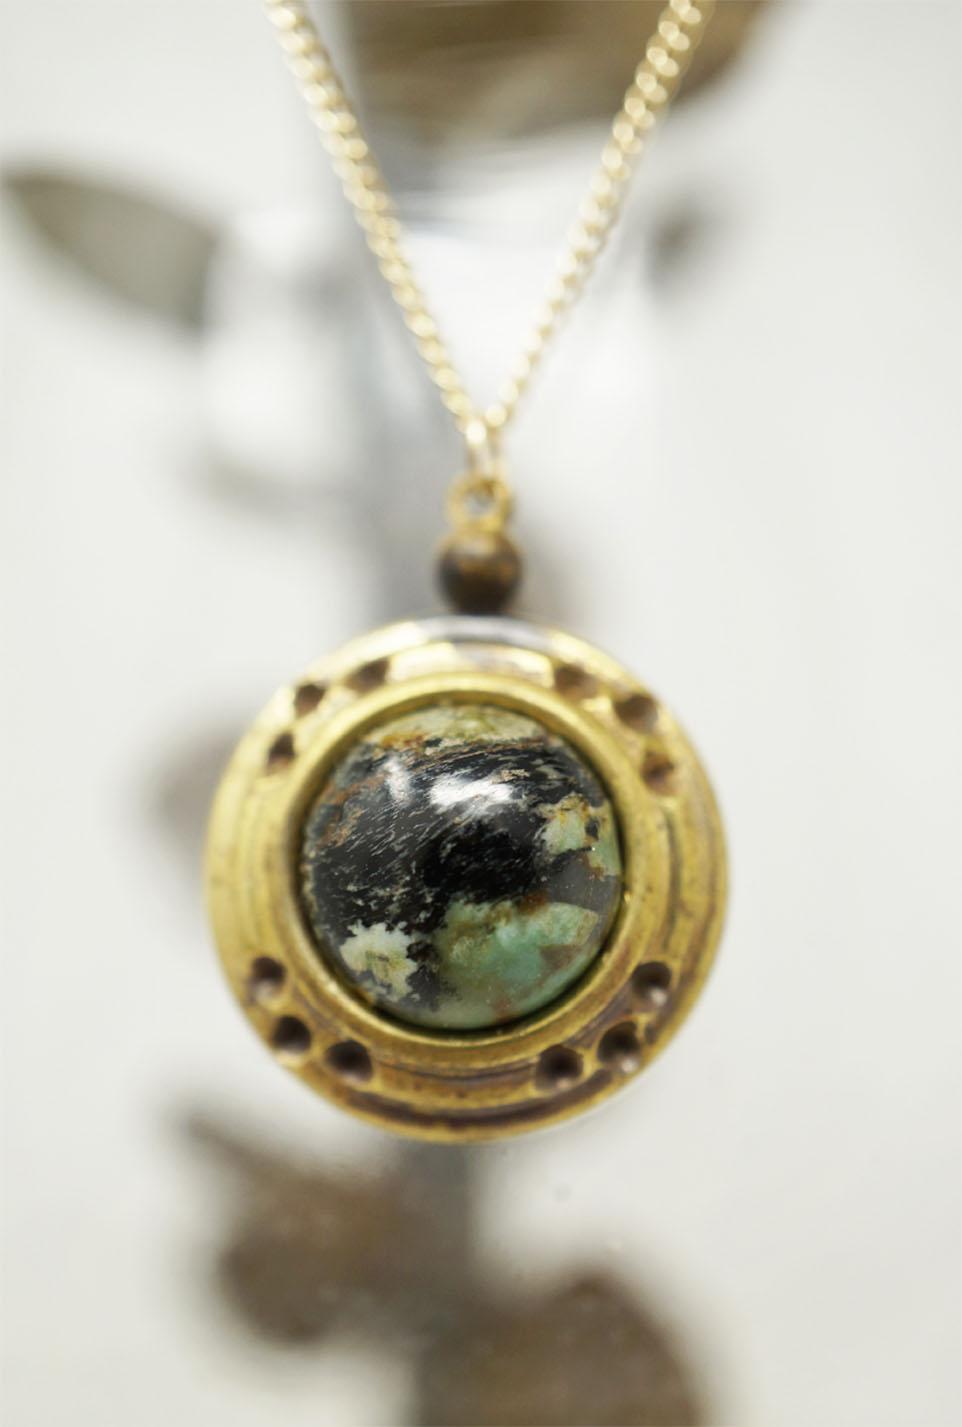 african-turquoise-vintage-medallion-necklace-1.jpg